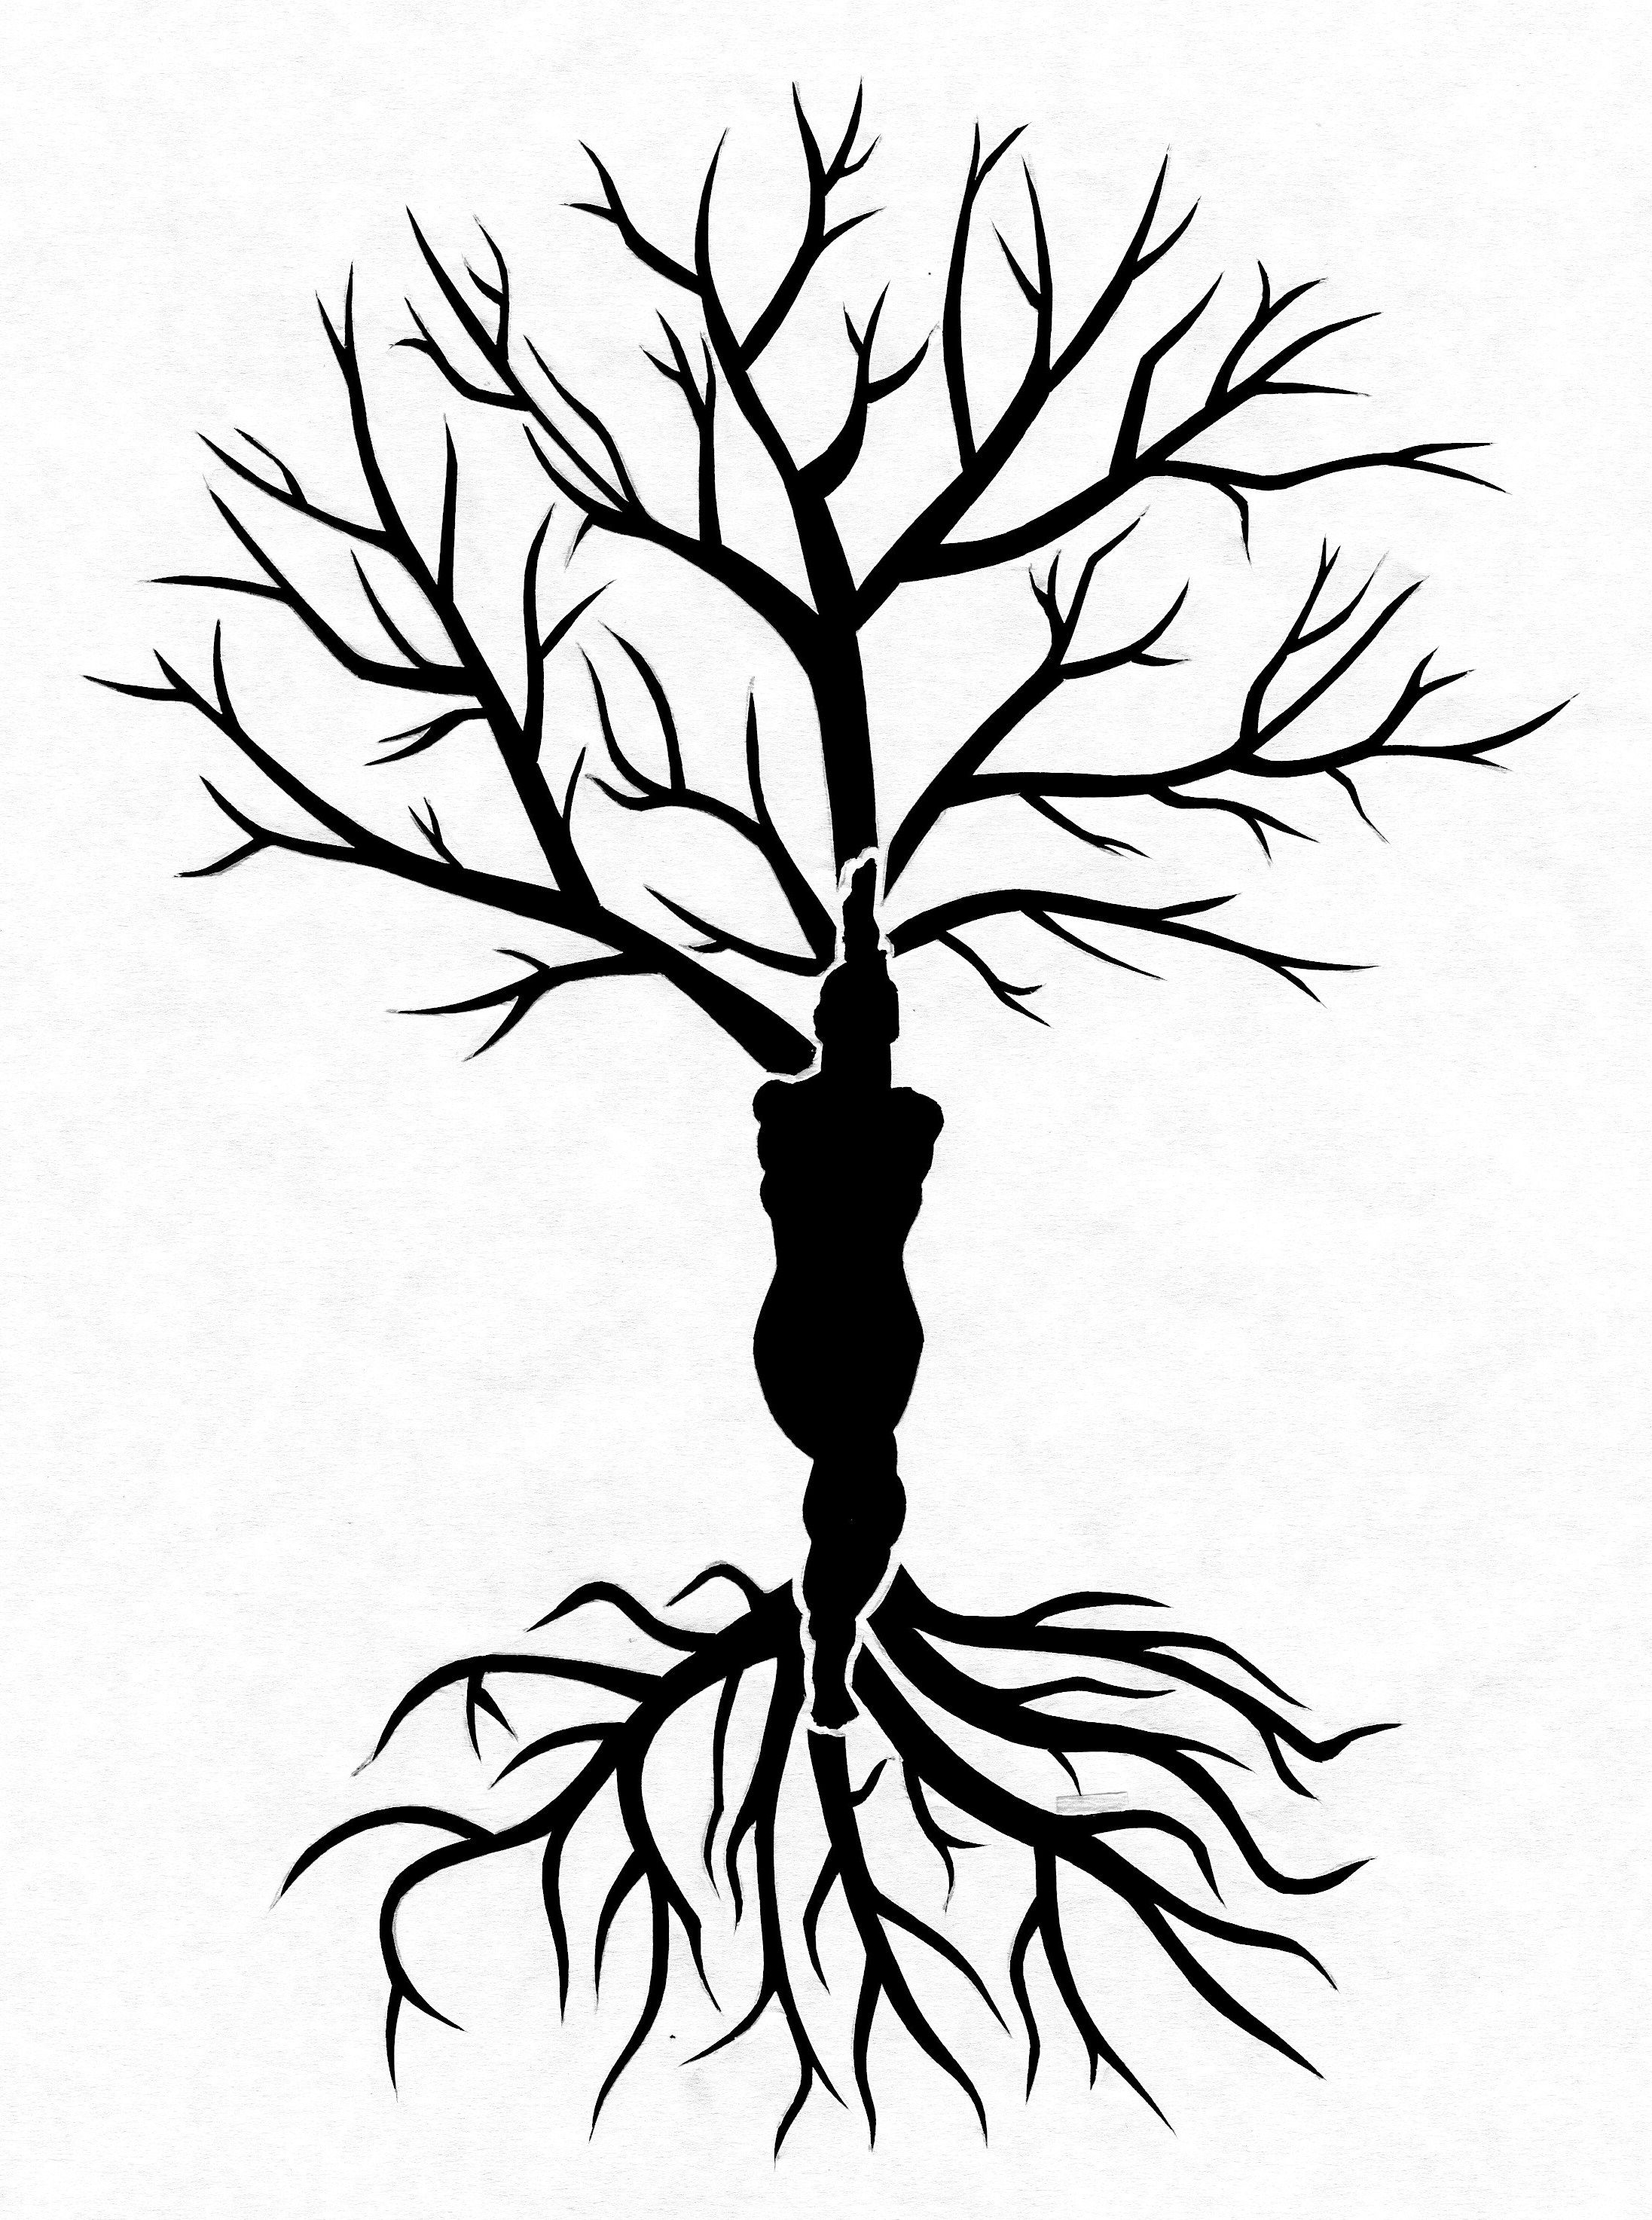 Yoga Eagle Pose Tree Of Life Stencil I Designed For Helen